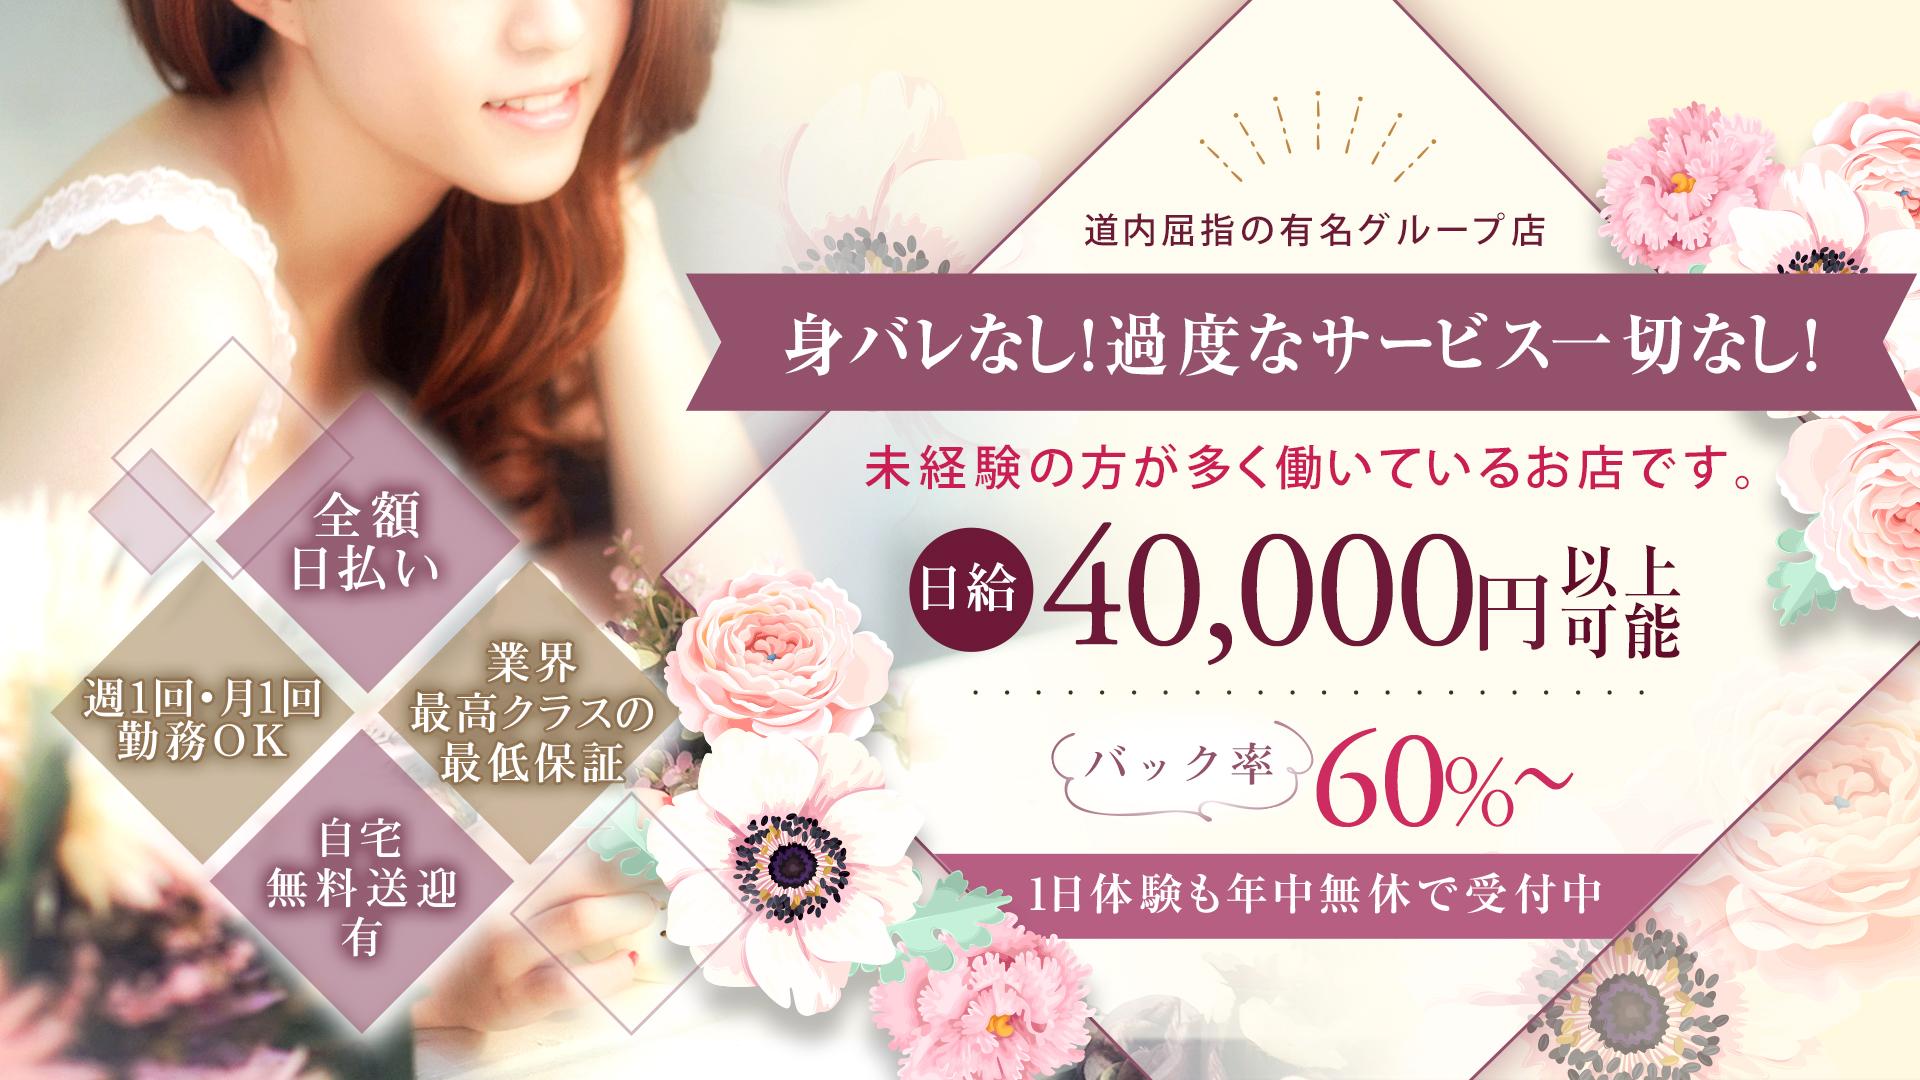 aroma Flan 札幌店の求人画像